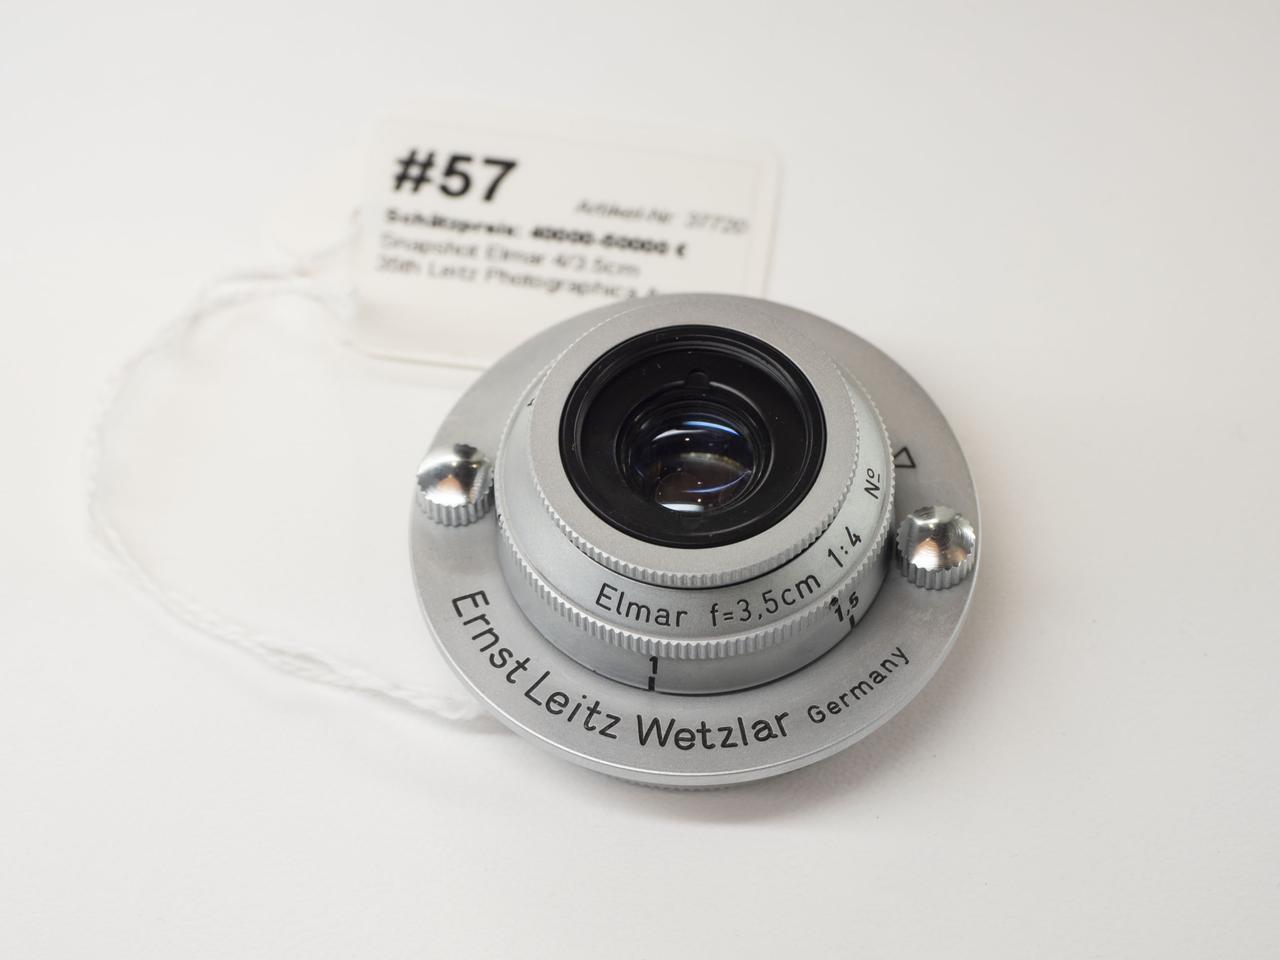 画像: 「Snapshot Elmar 4/3.5cm」